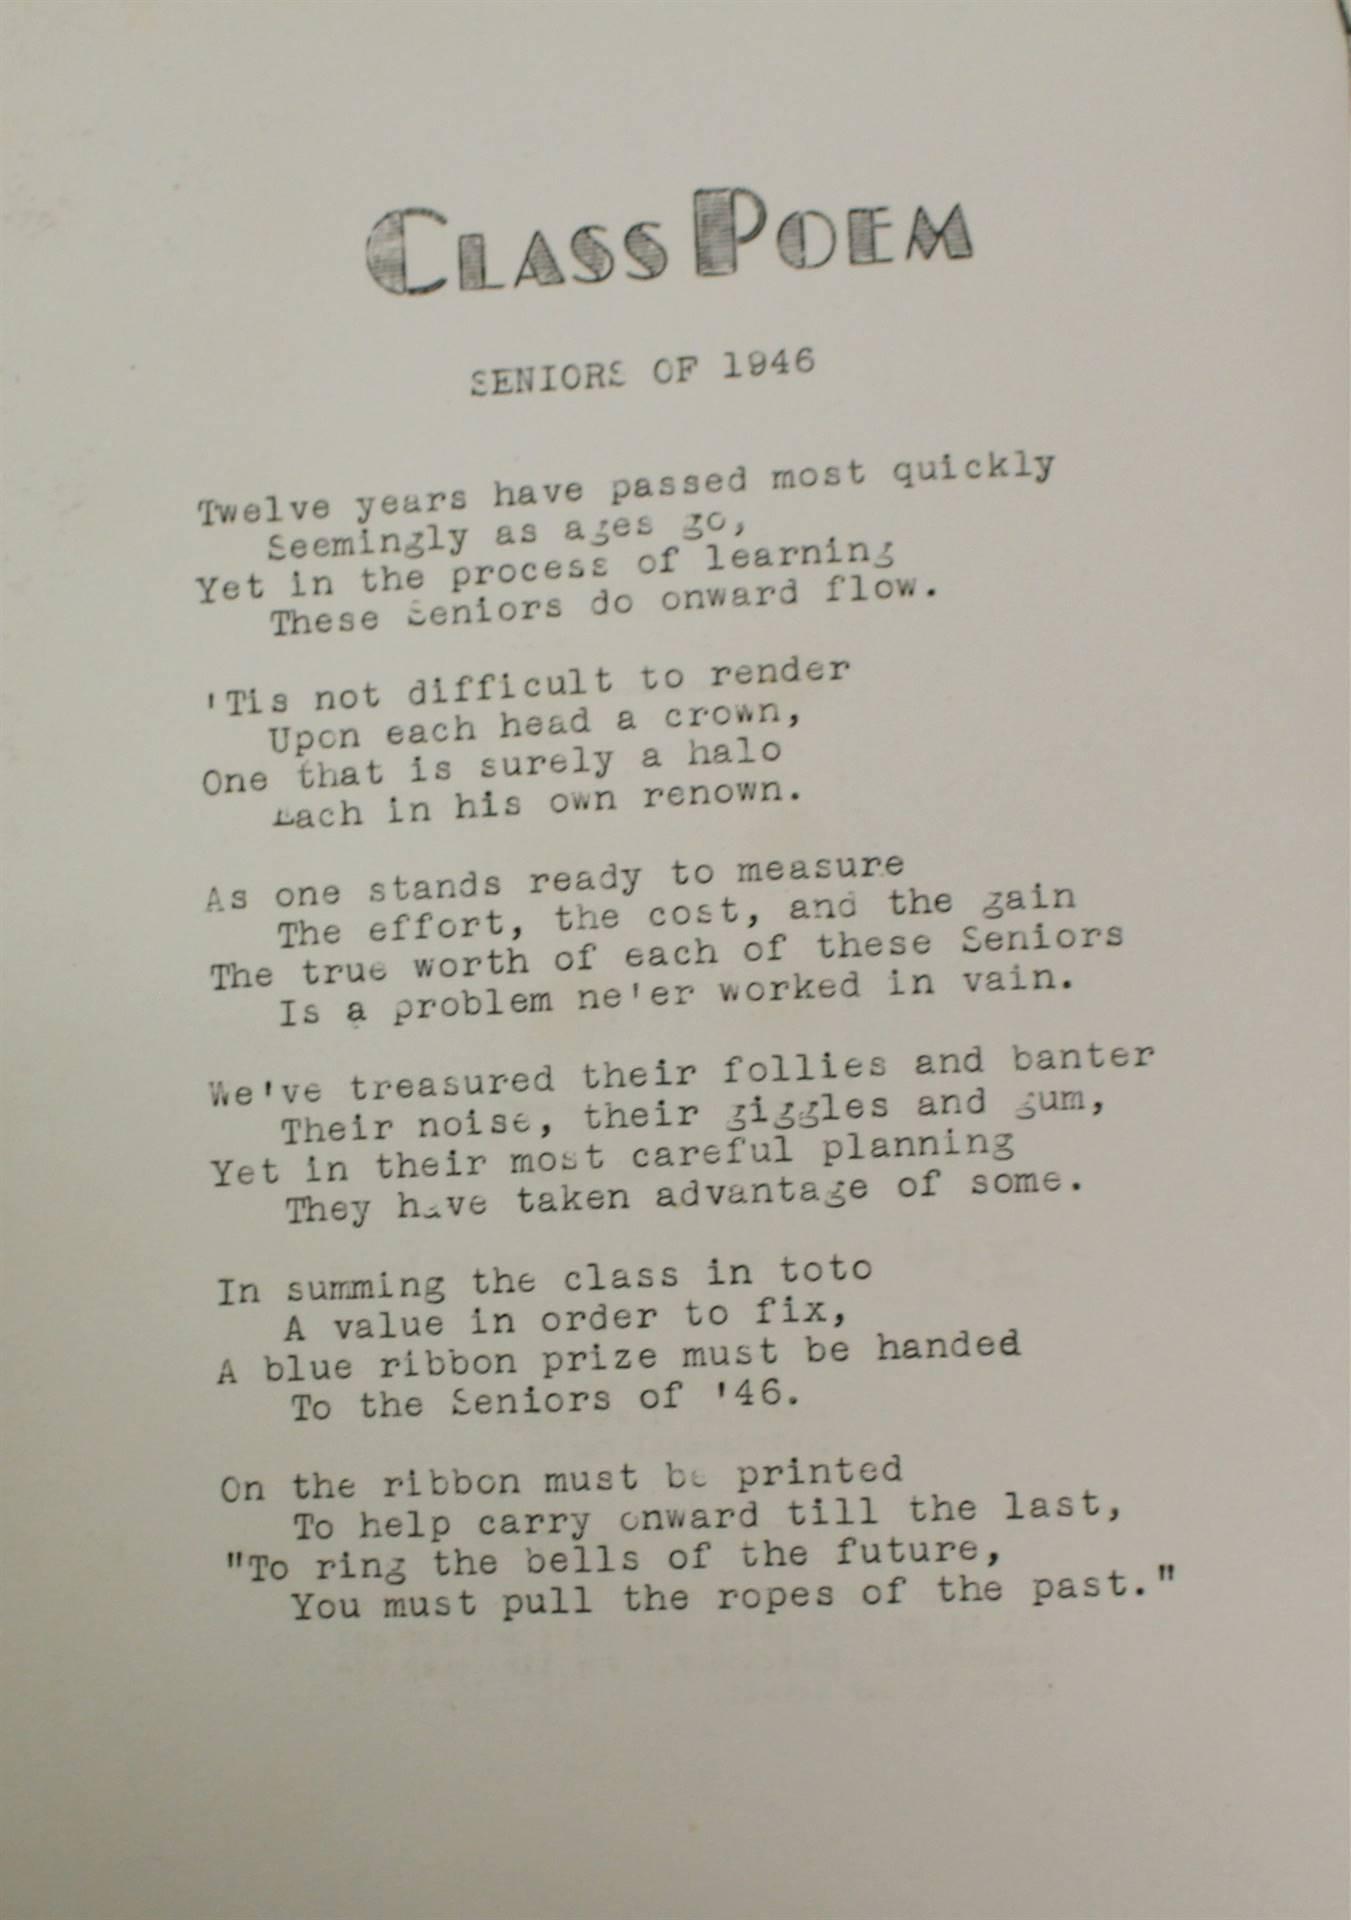 1946 Class Poem